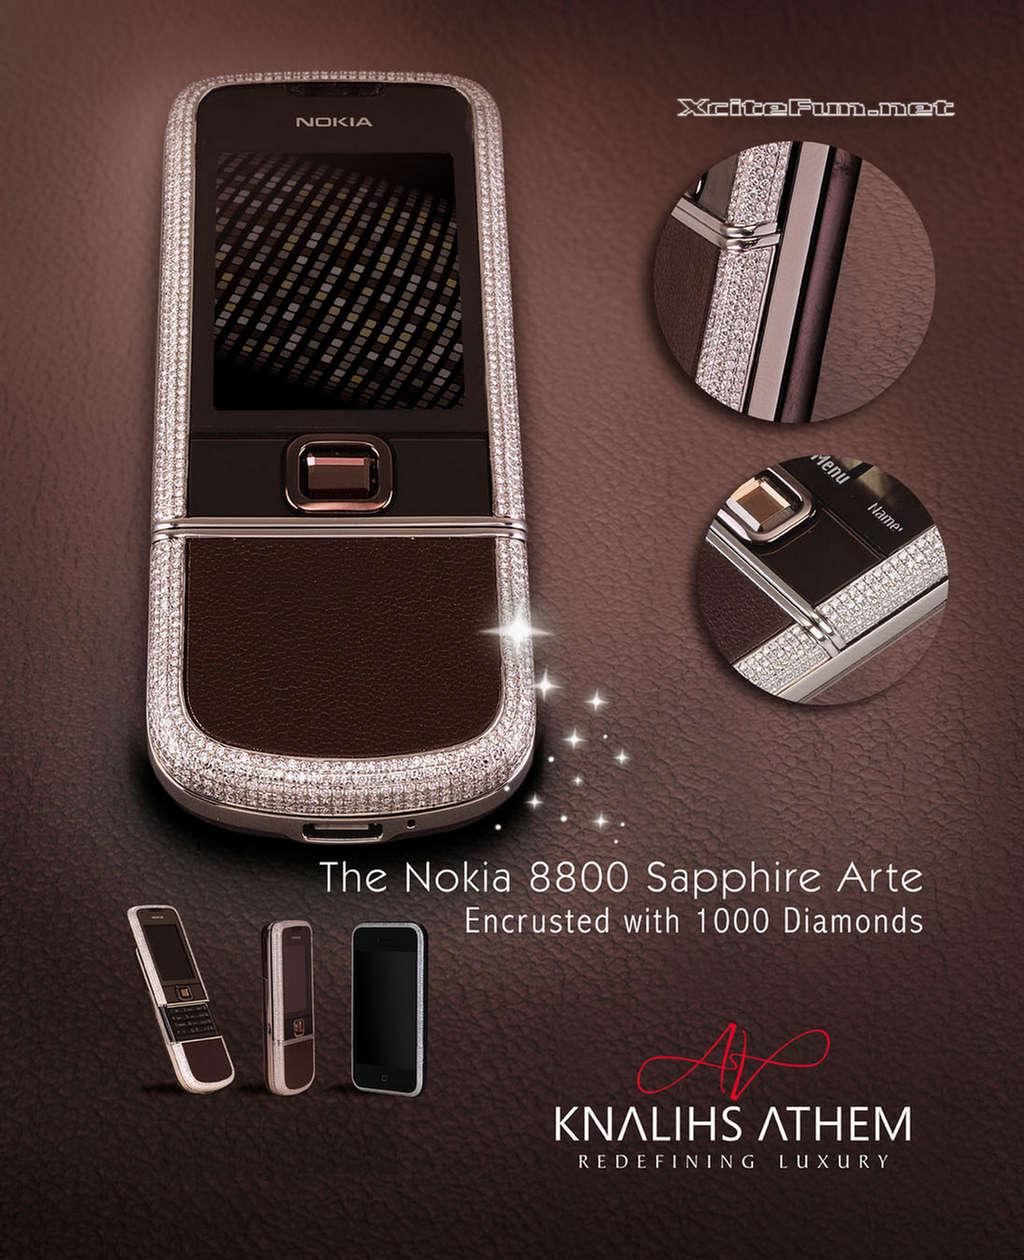 Diamond Encrusted Nokia 8800 Sapphire Arte  Sparkly Gadget